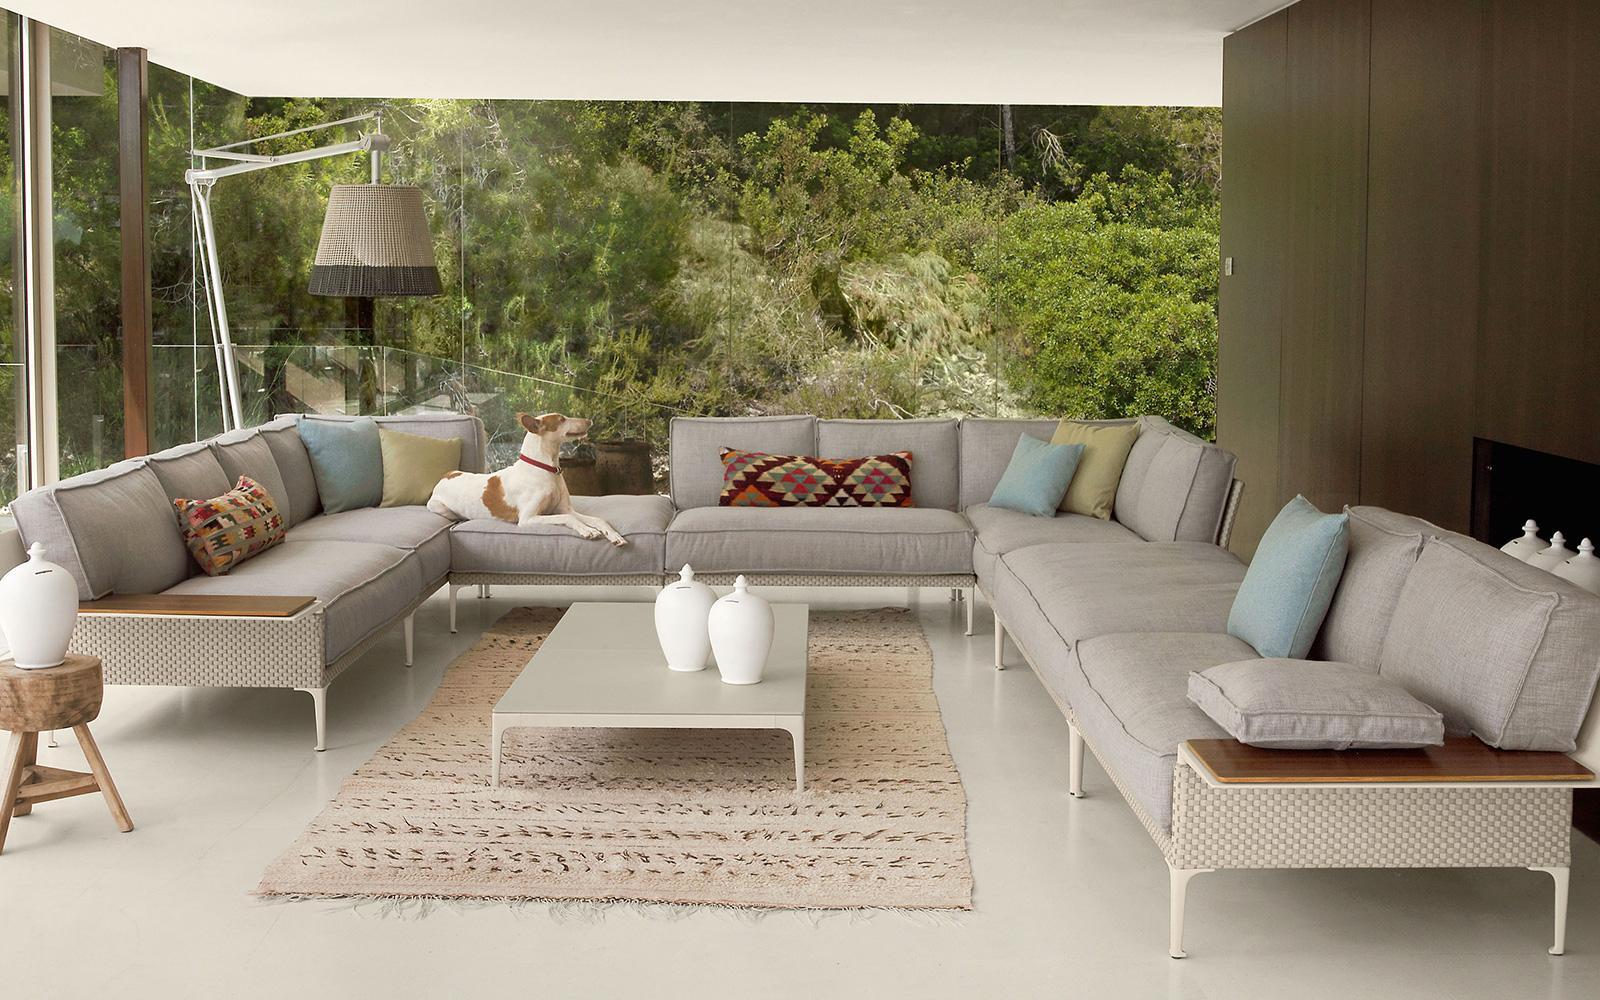 gartenm bel outdoor living ausprobieren kelzenberg einrichtungen. Black Bedroom Furniture Sets. Home Design Ideas